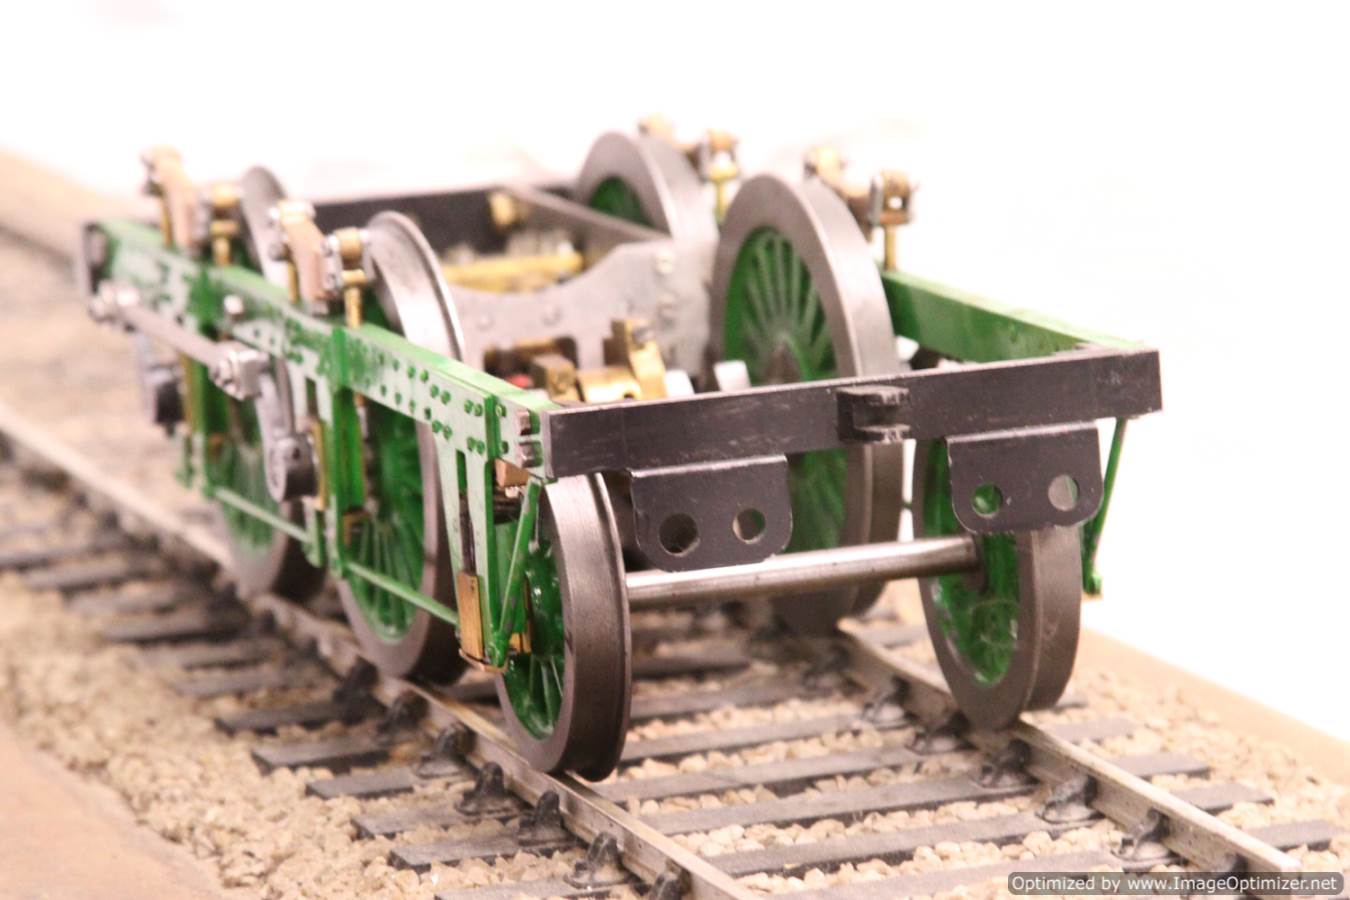 test 3-5-inch-gauge-lion-locomotive-chassis-for-sale-15-optimized